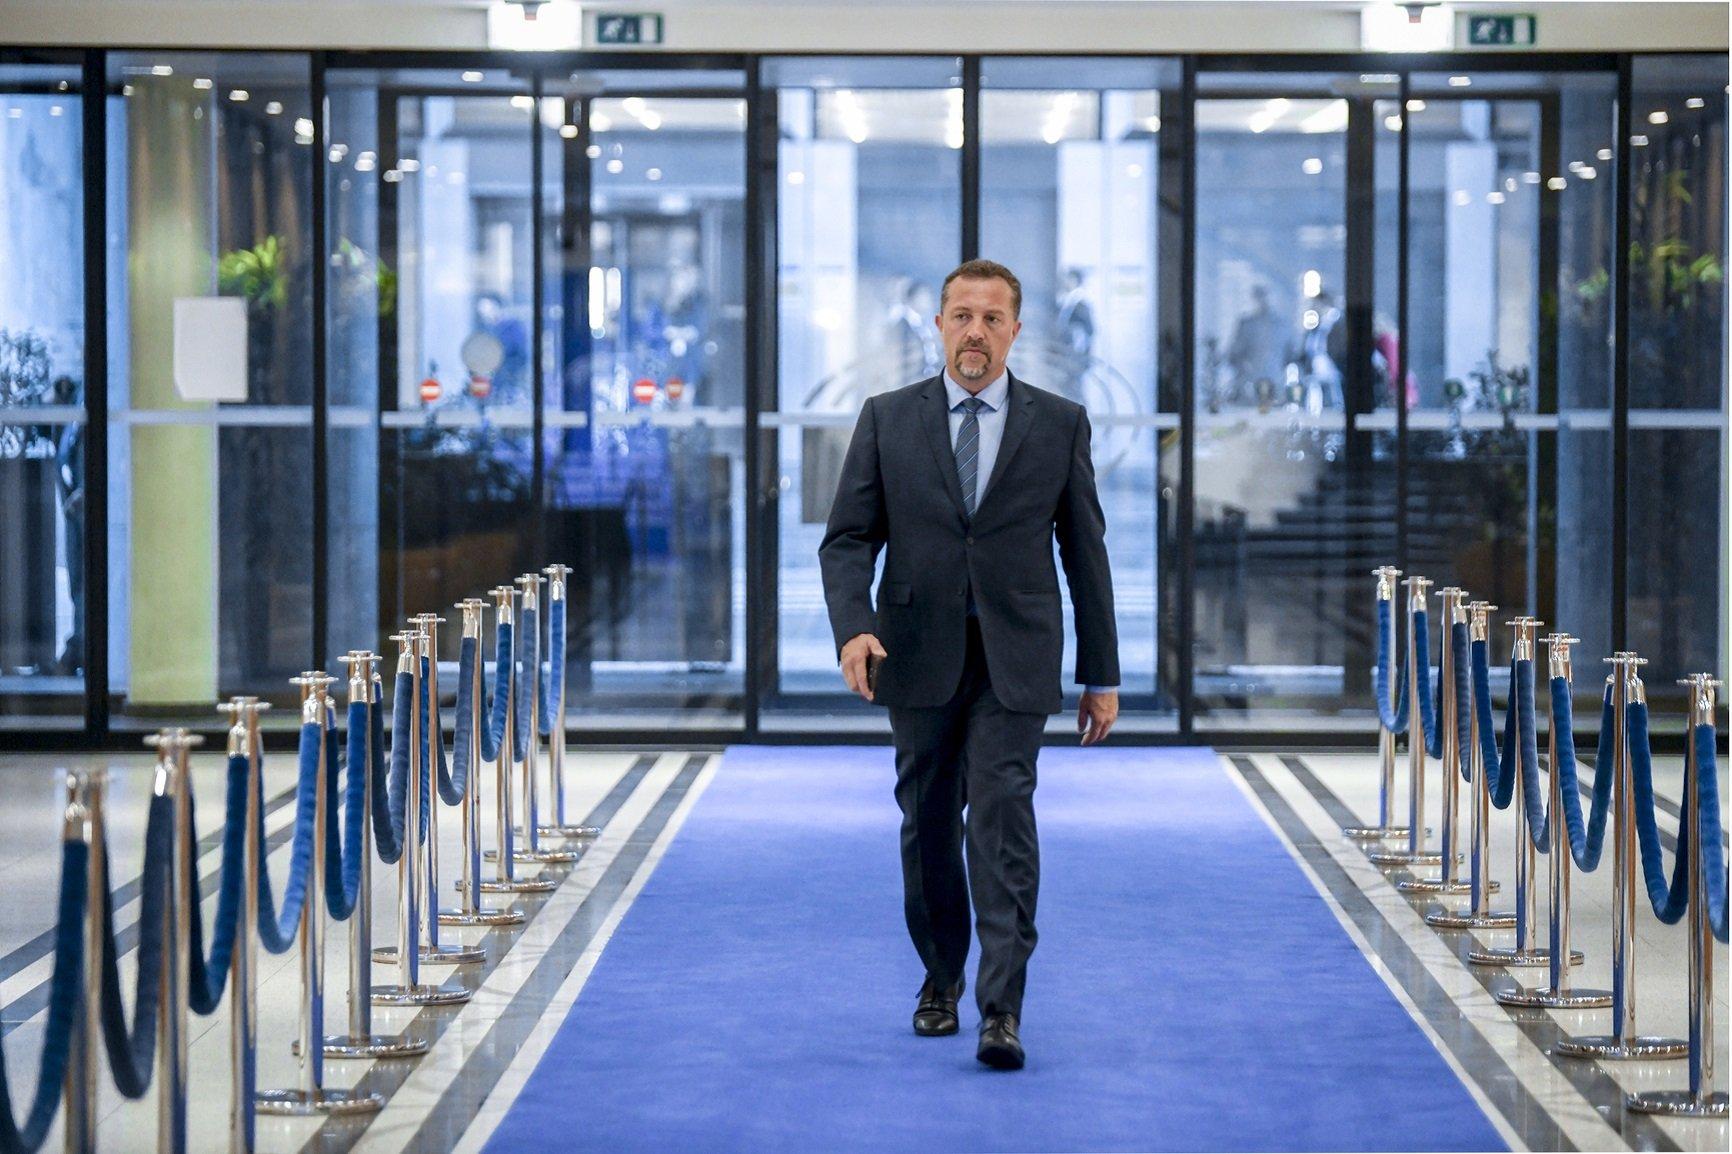 Ivo-Hristov-MEP